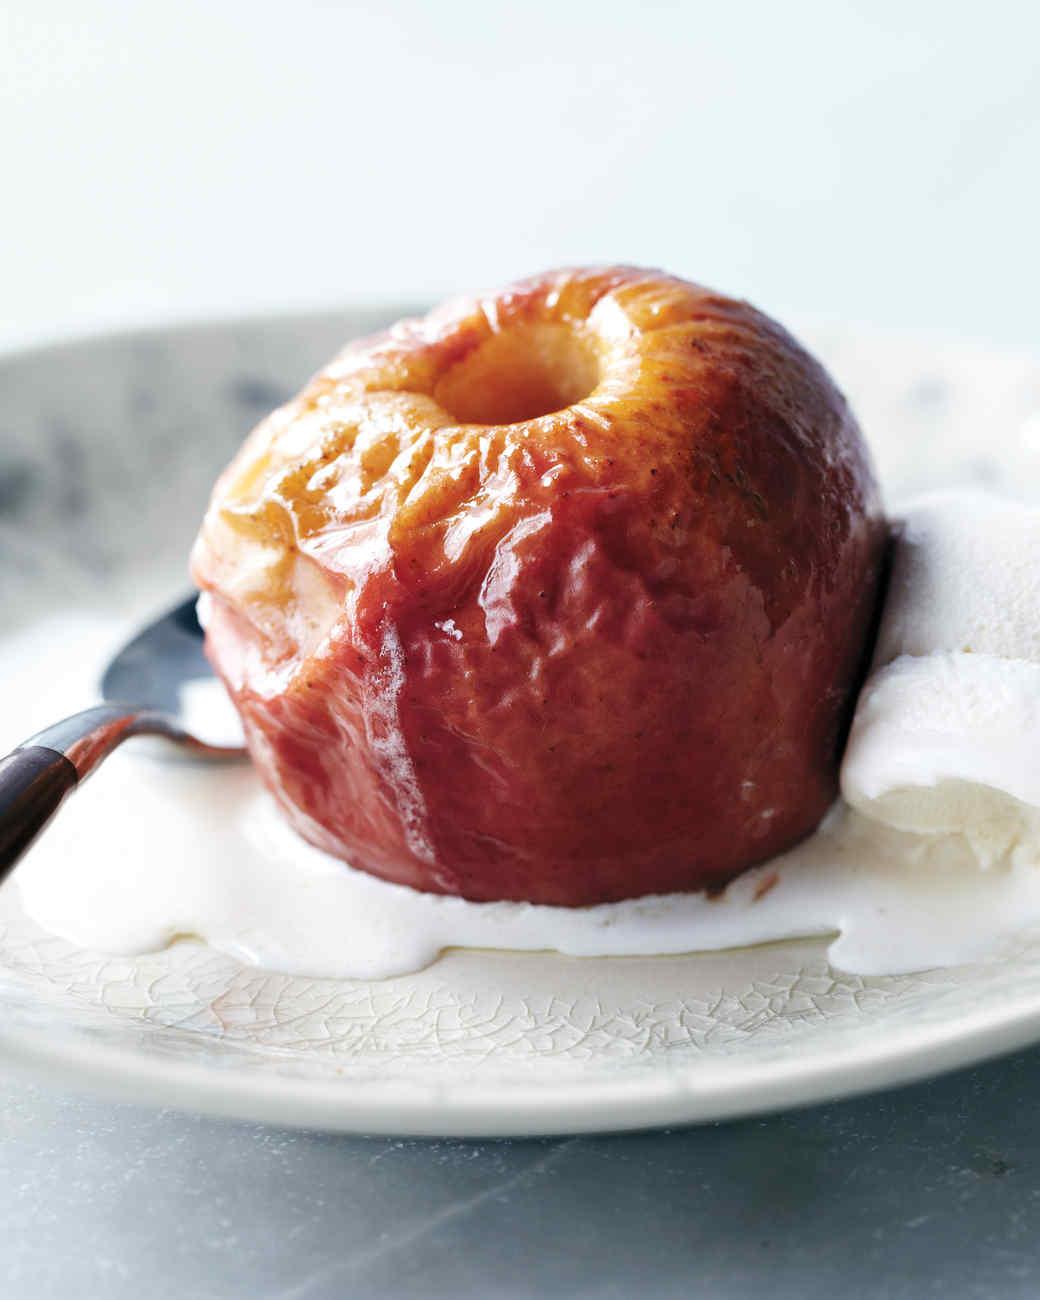 apple-dessert-mld109446.jpg